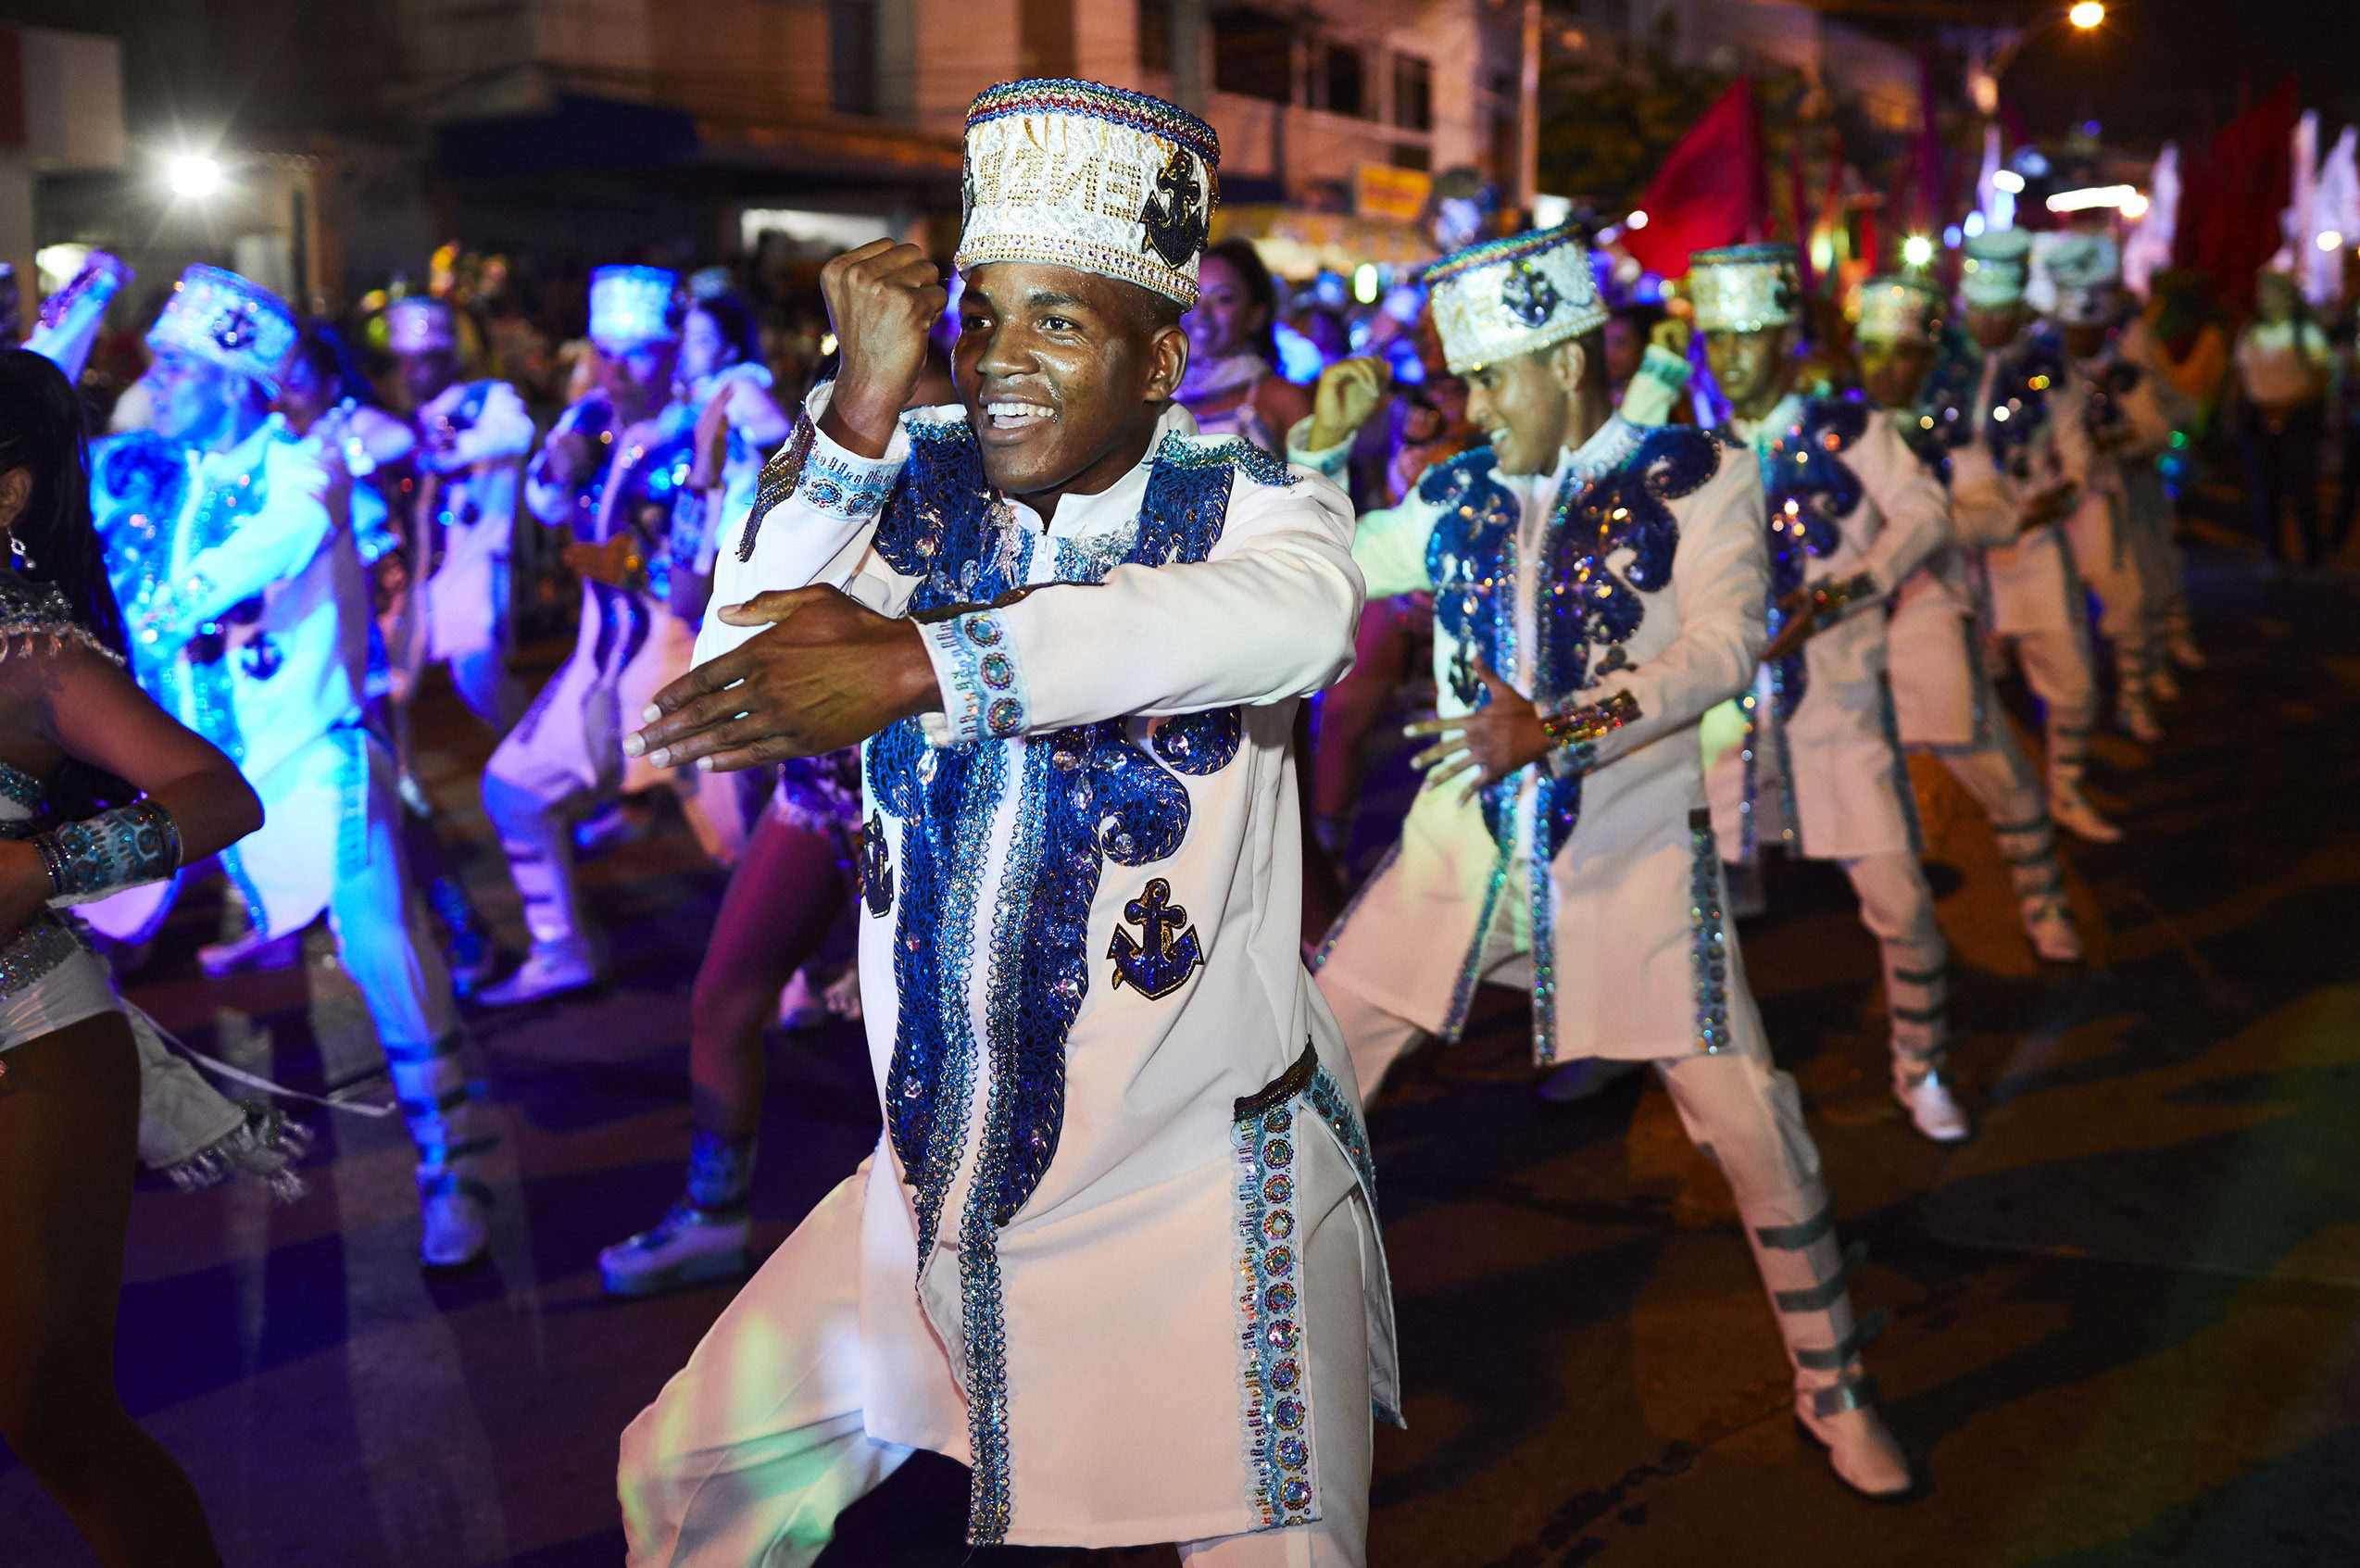 Portafolio Carnaval Cultura Barranquilla